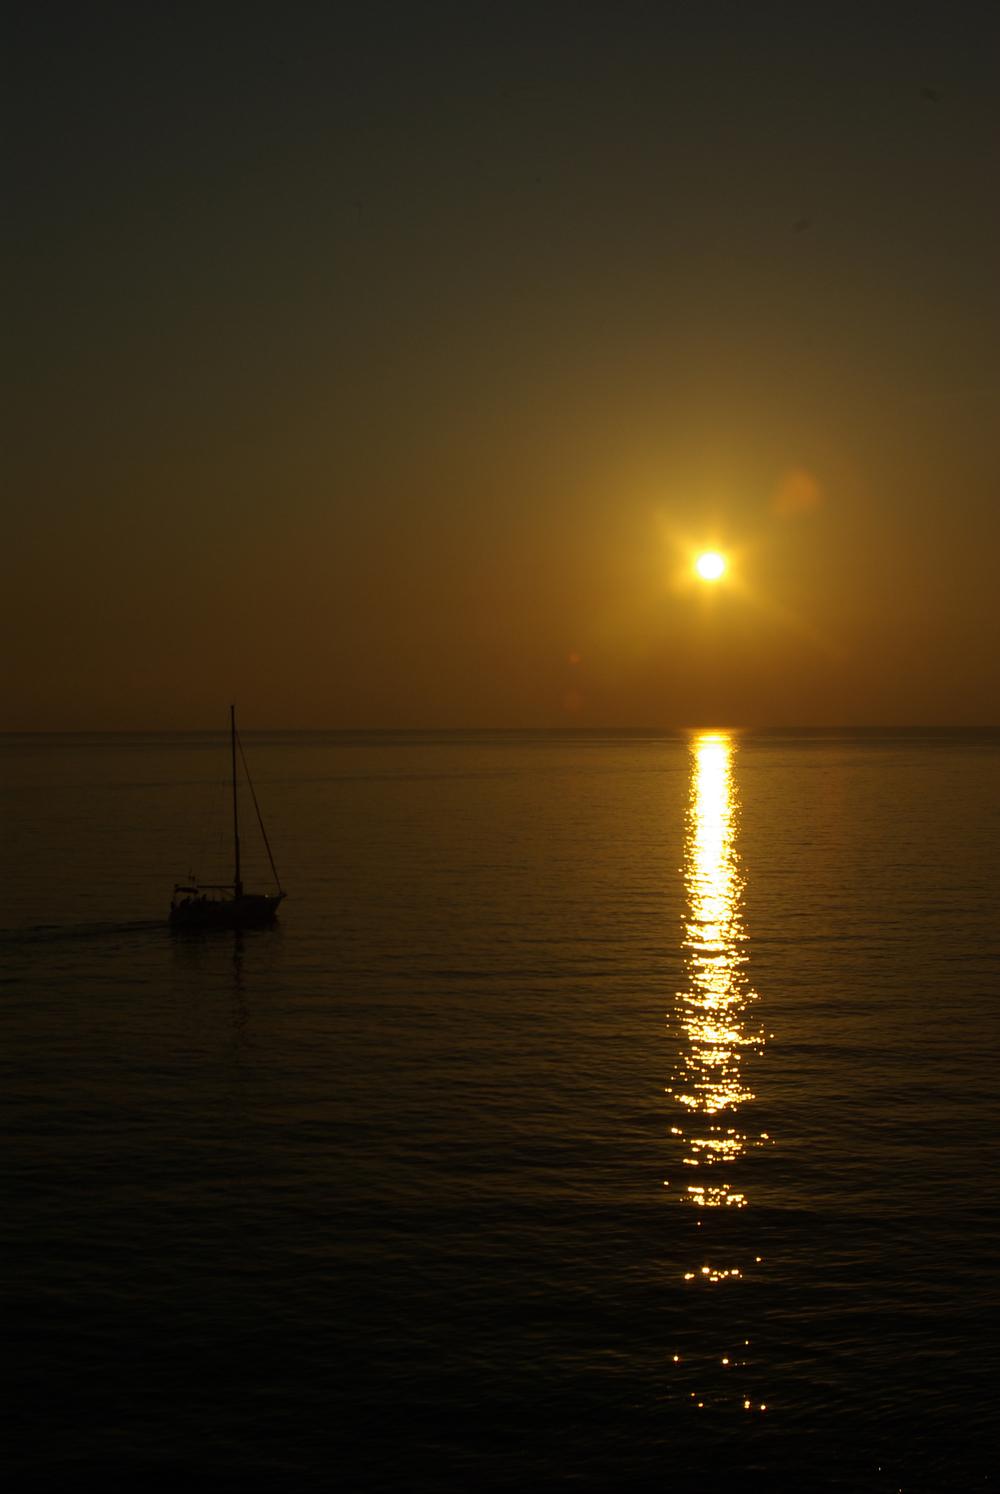 Sunset #3